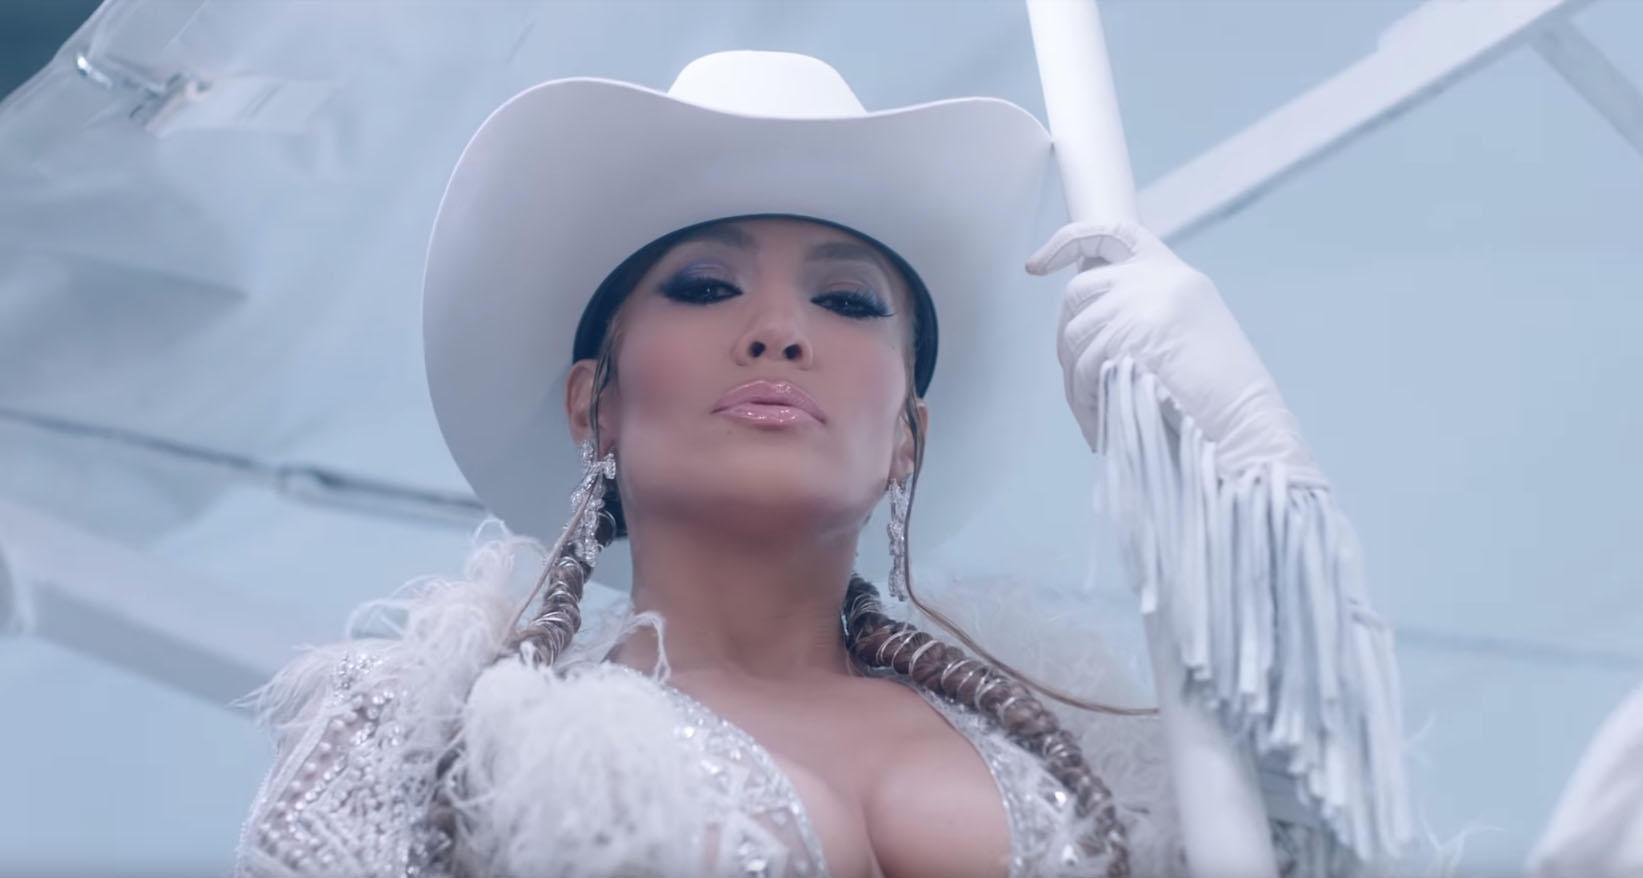 Jennifer Lopez, il video super hot del nuovo singolo manda i fan in tilt